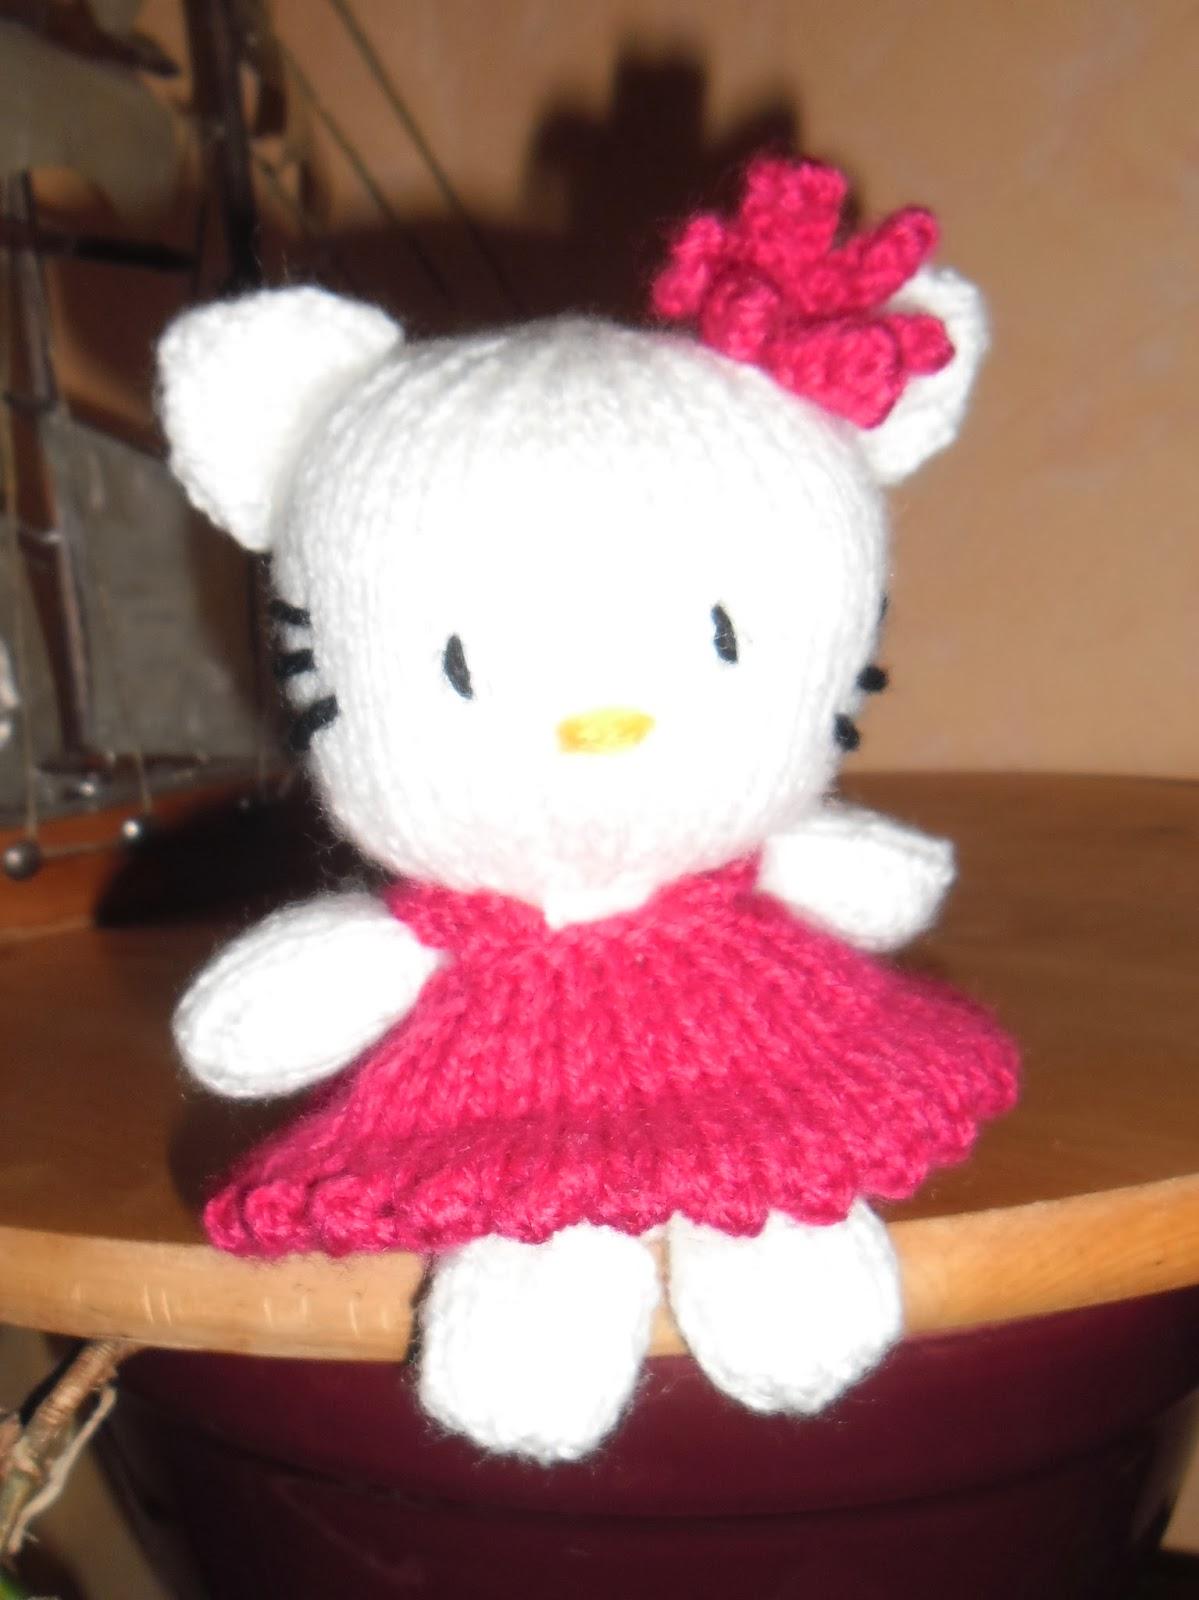 Du tricot et des jouets joyeux no l avec hello kitty - Modele hello kitty ...